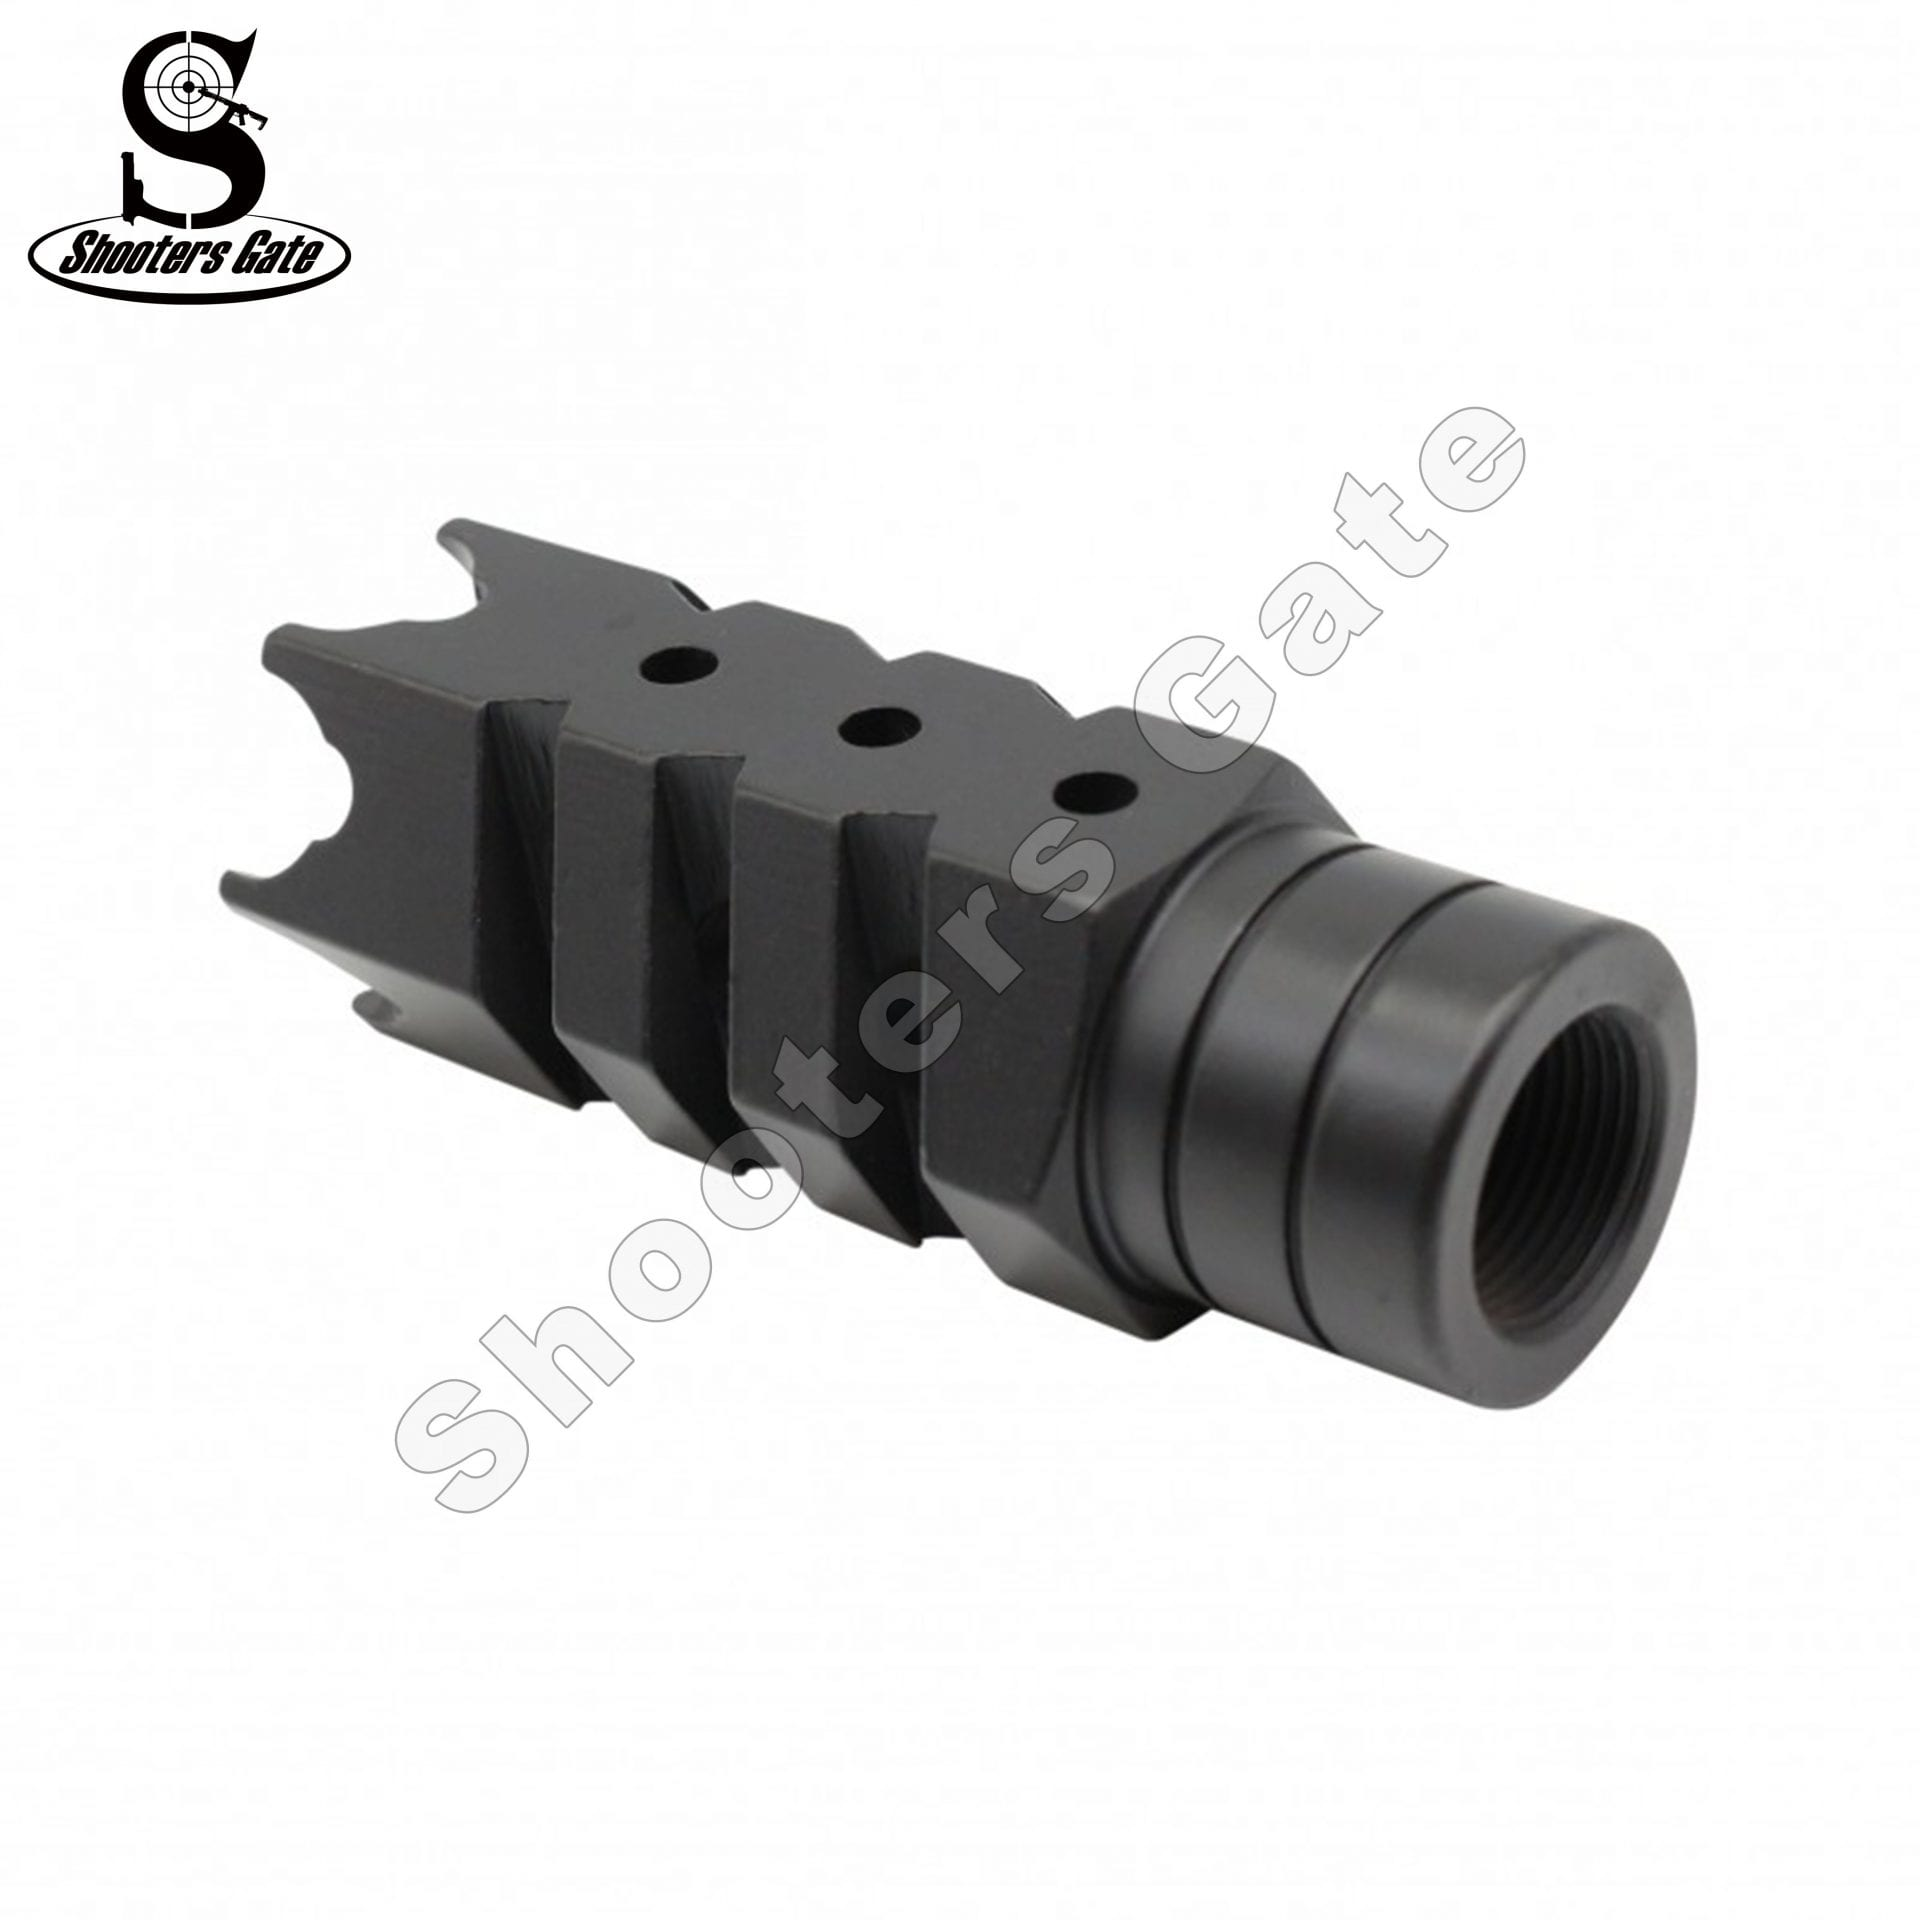 AR15/M4 .223/5.56 Muzzle Break 1/2x28 Thread, Black